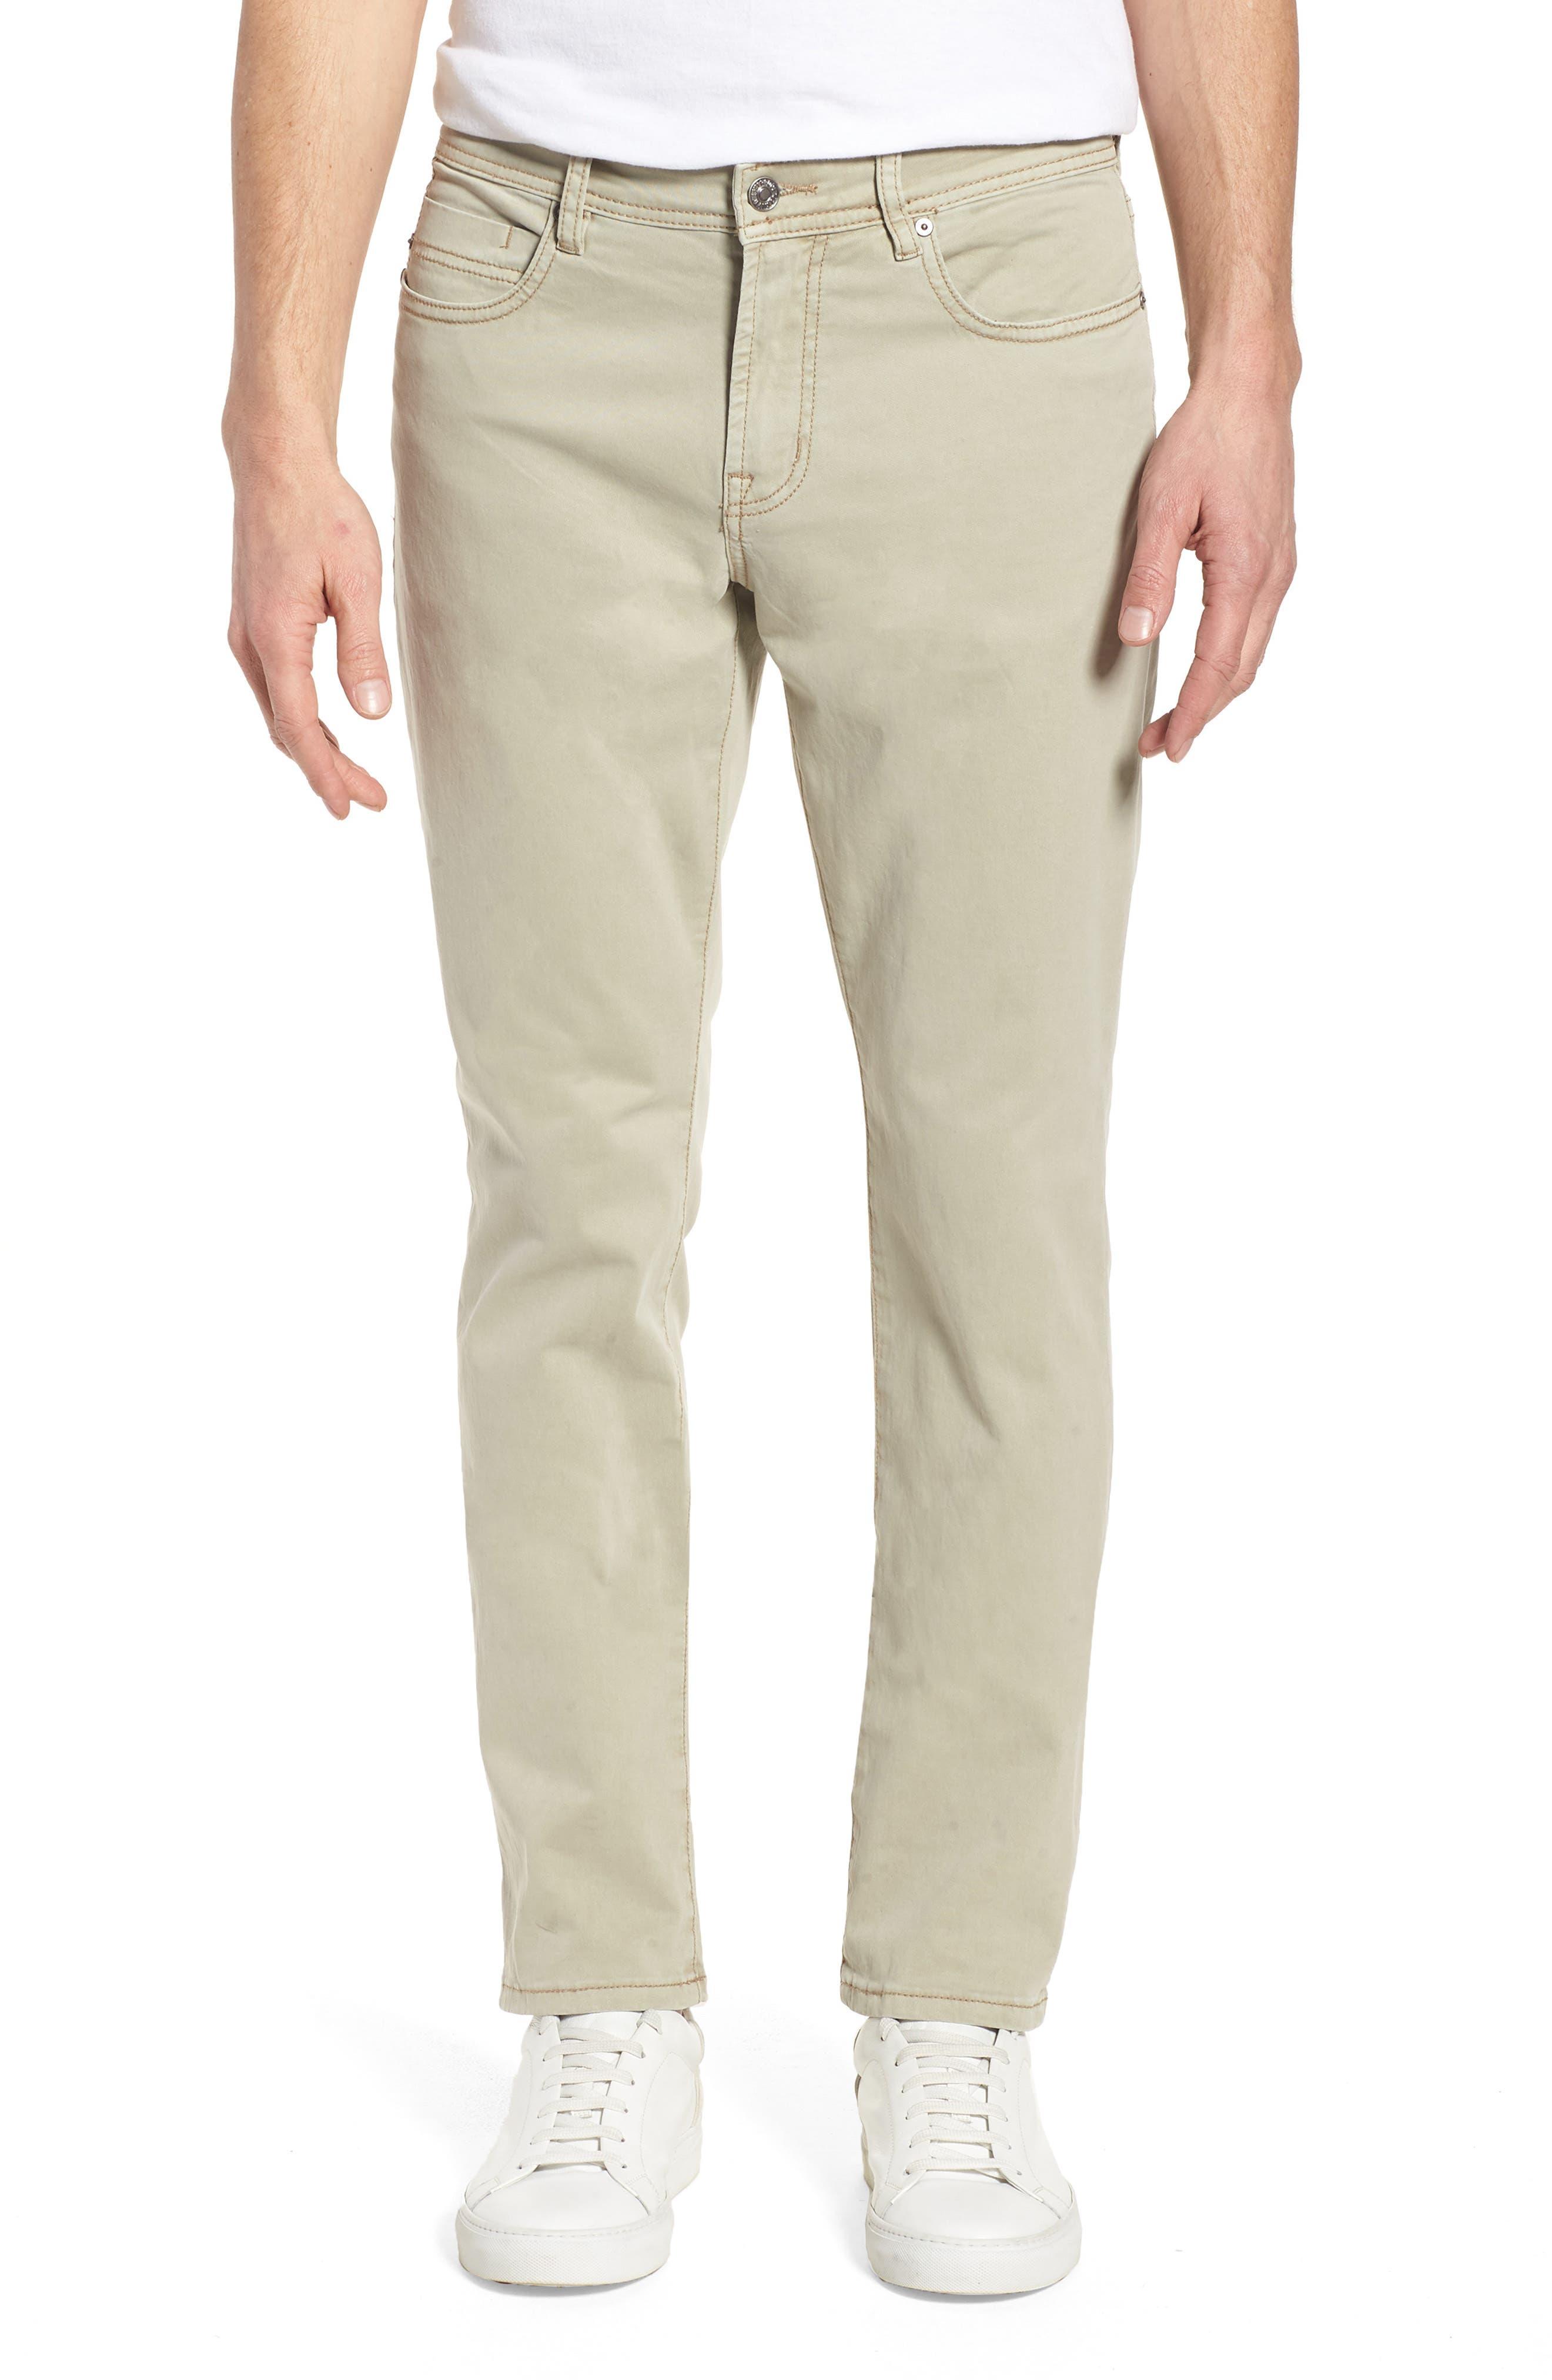 Jeans Co. Kingston Slim Straight Leg Jeans,                             Main thumbnail 1, color,                             SANDSTROM